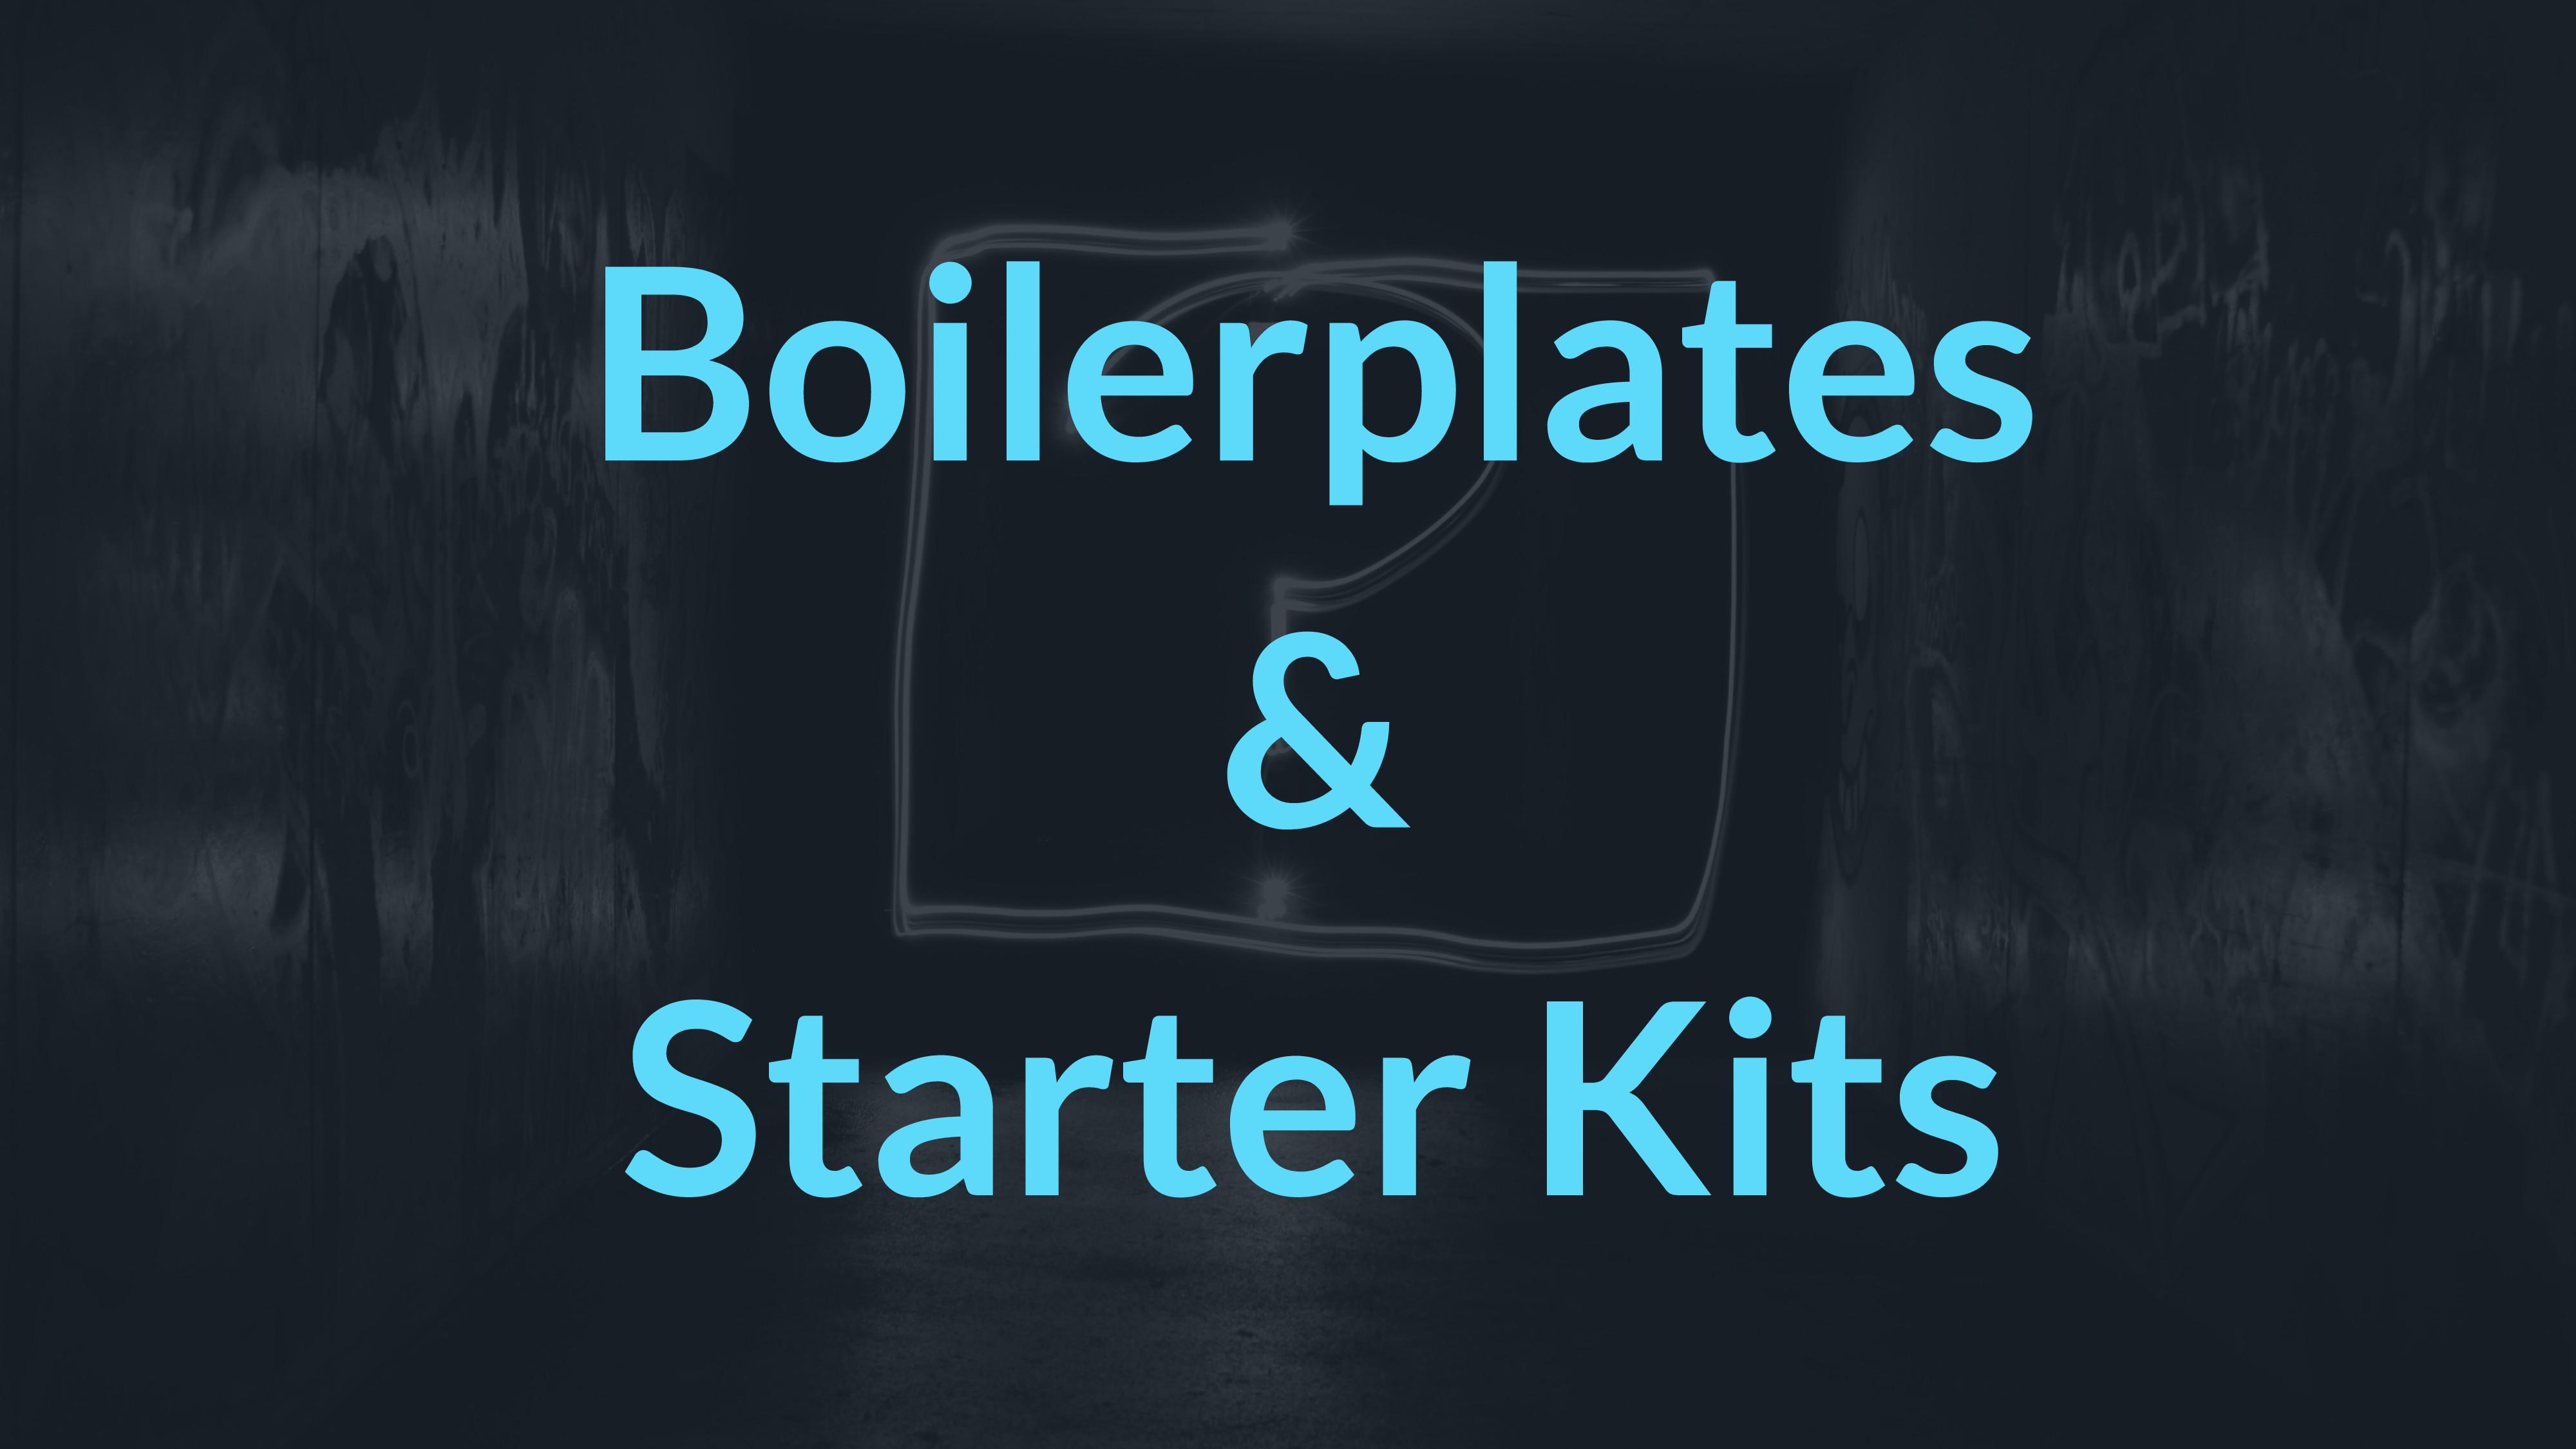 Boilerplates & Starter Kits